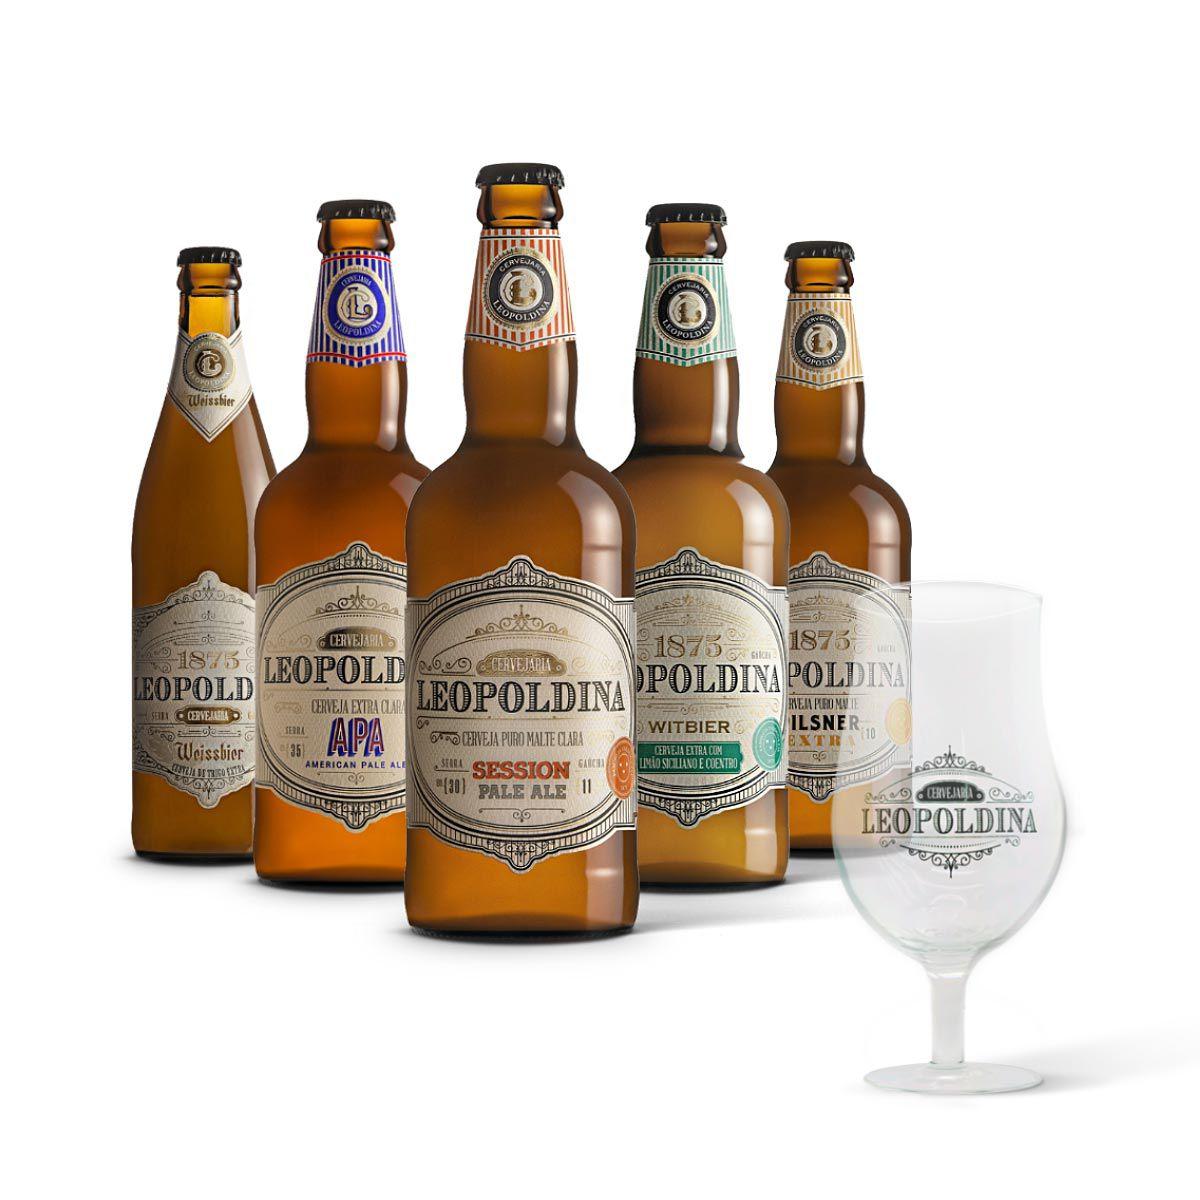 Kit degustação Leopoldina 5 cervejas + Taça Tulipa Leopoldina